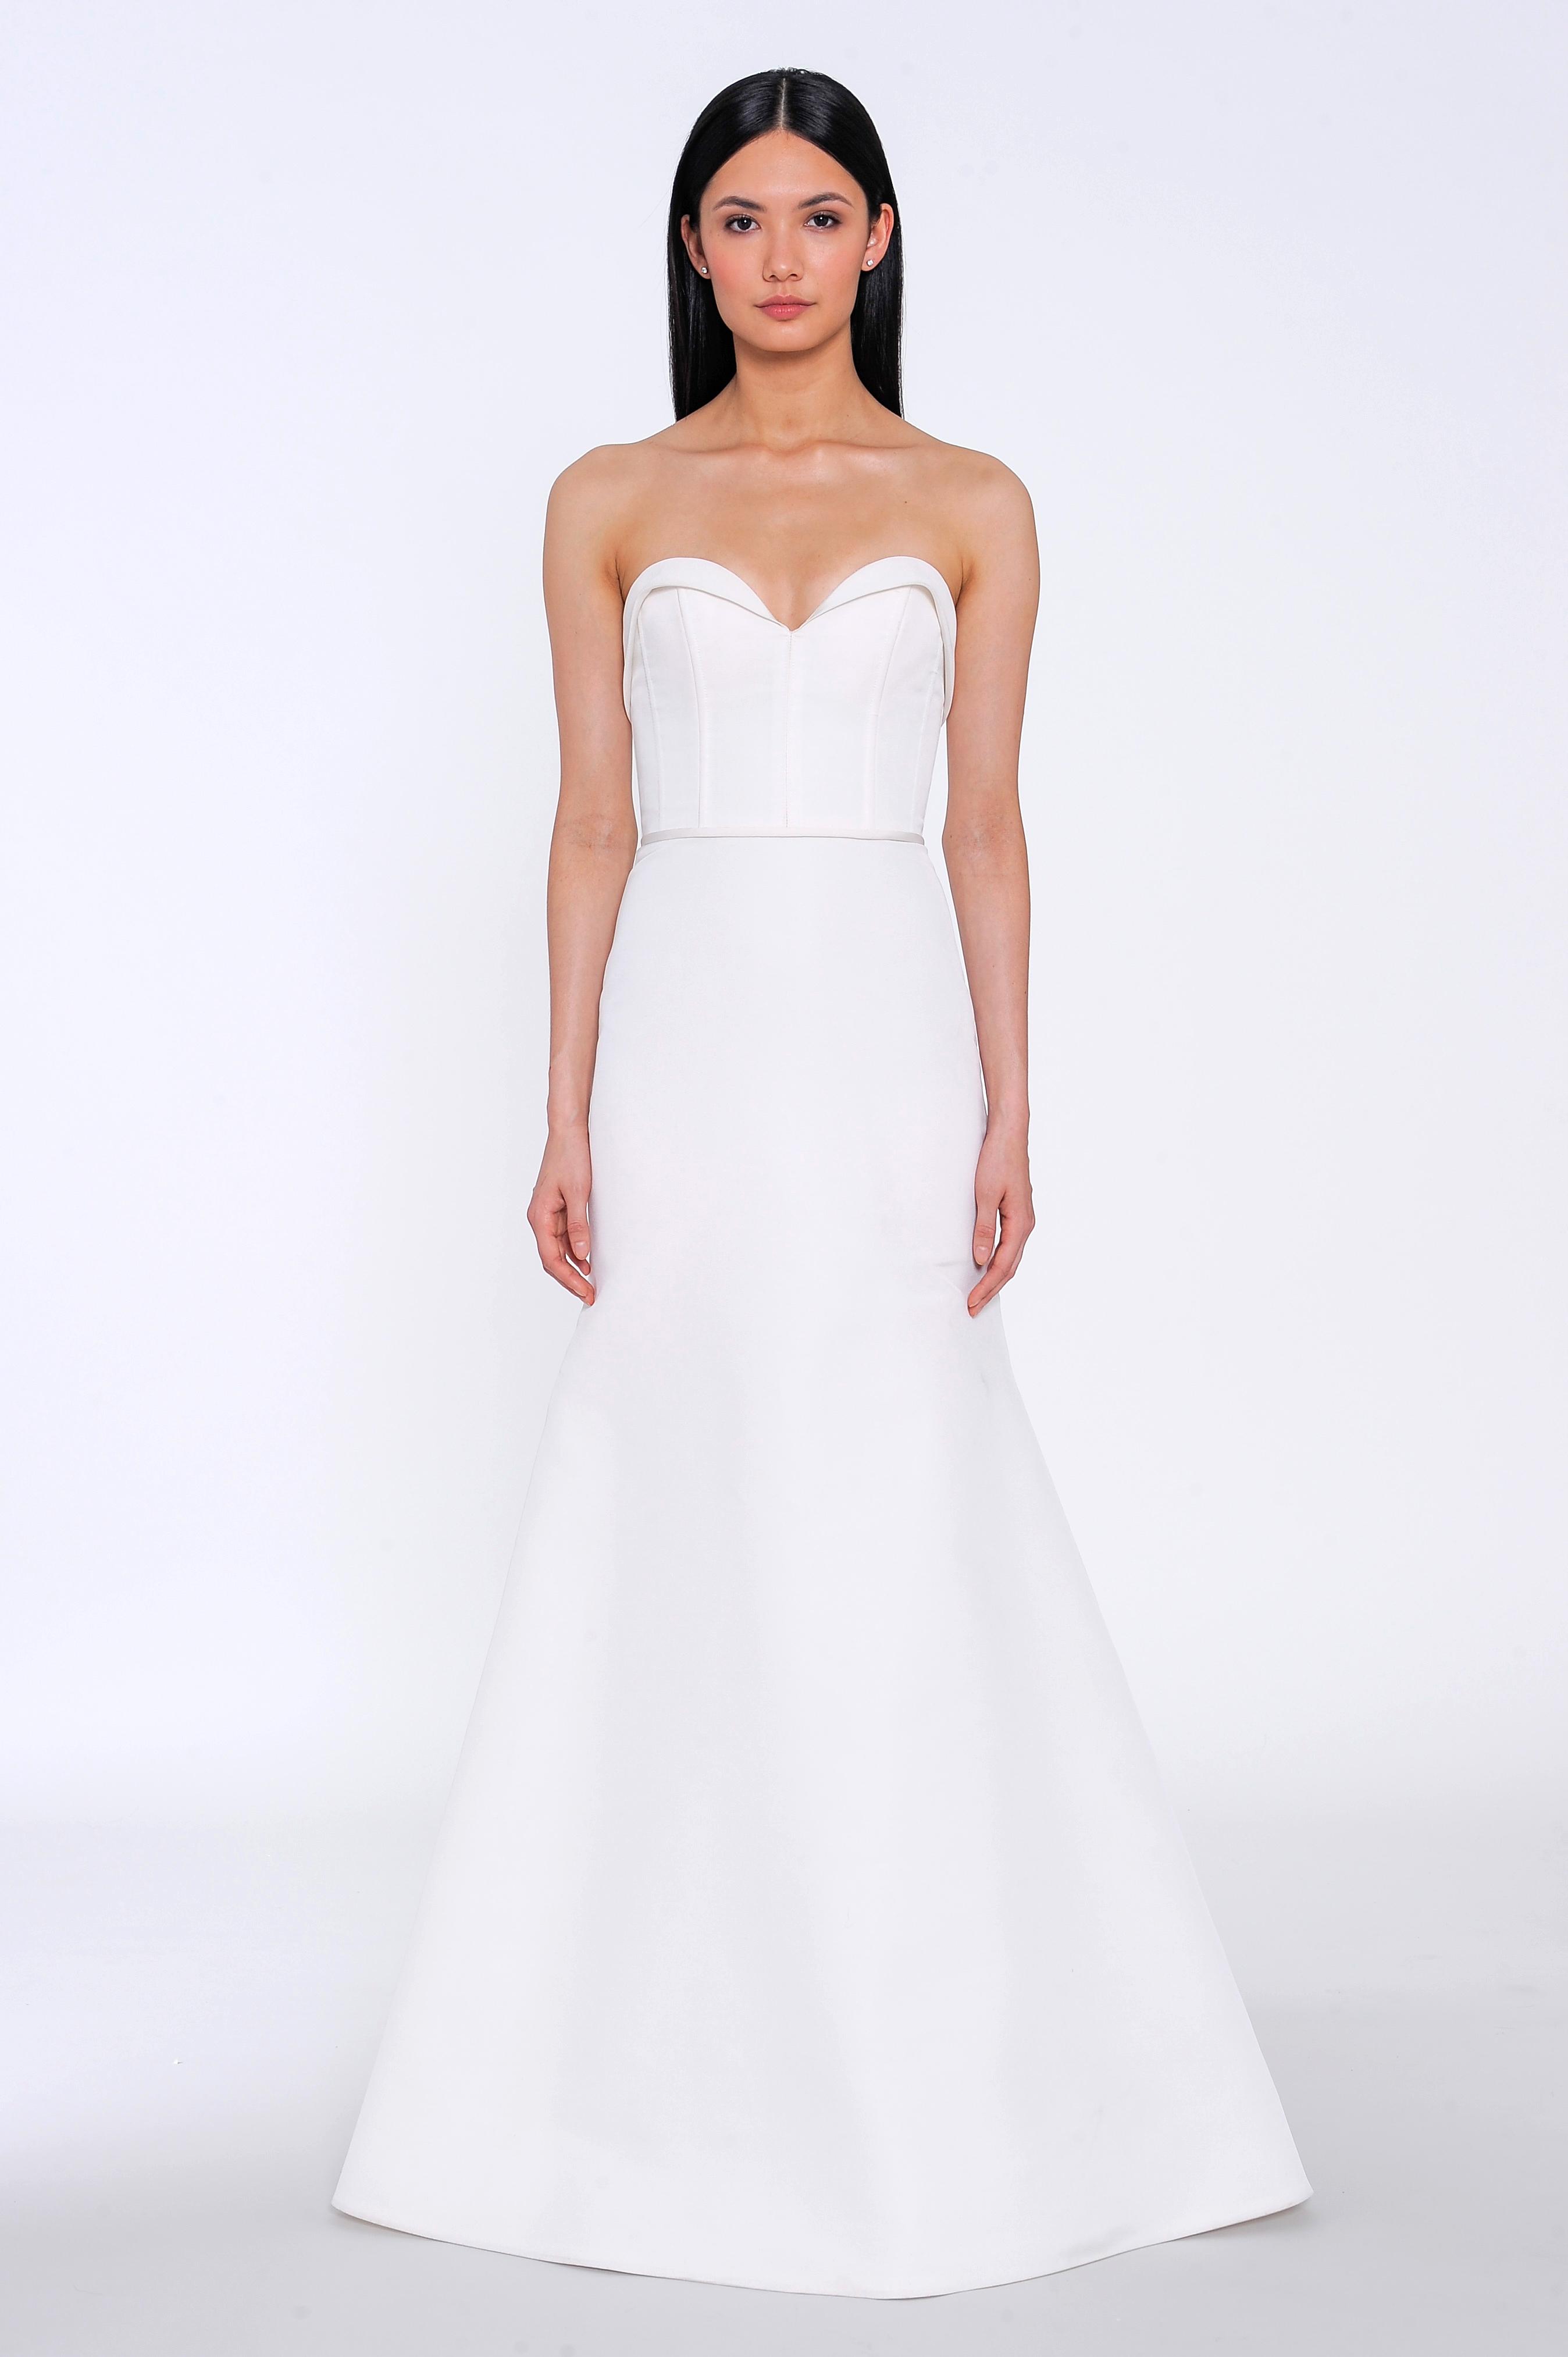 allison webb wedding dress spring 2019 sweetheart a-line